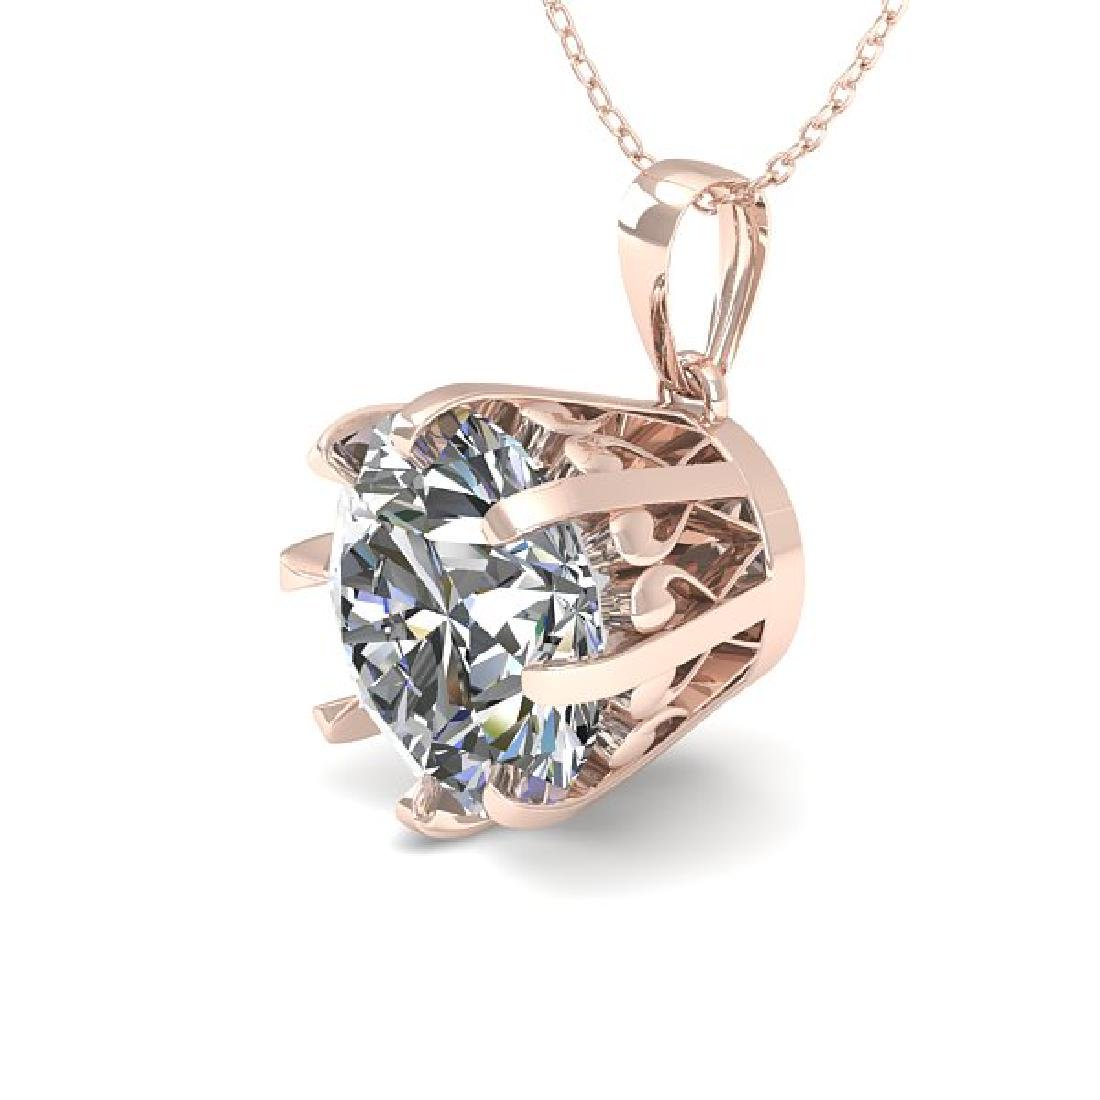 2 CTW VS/SI Diamond Solitaire Necklace 14K Rose Gold